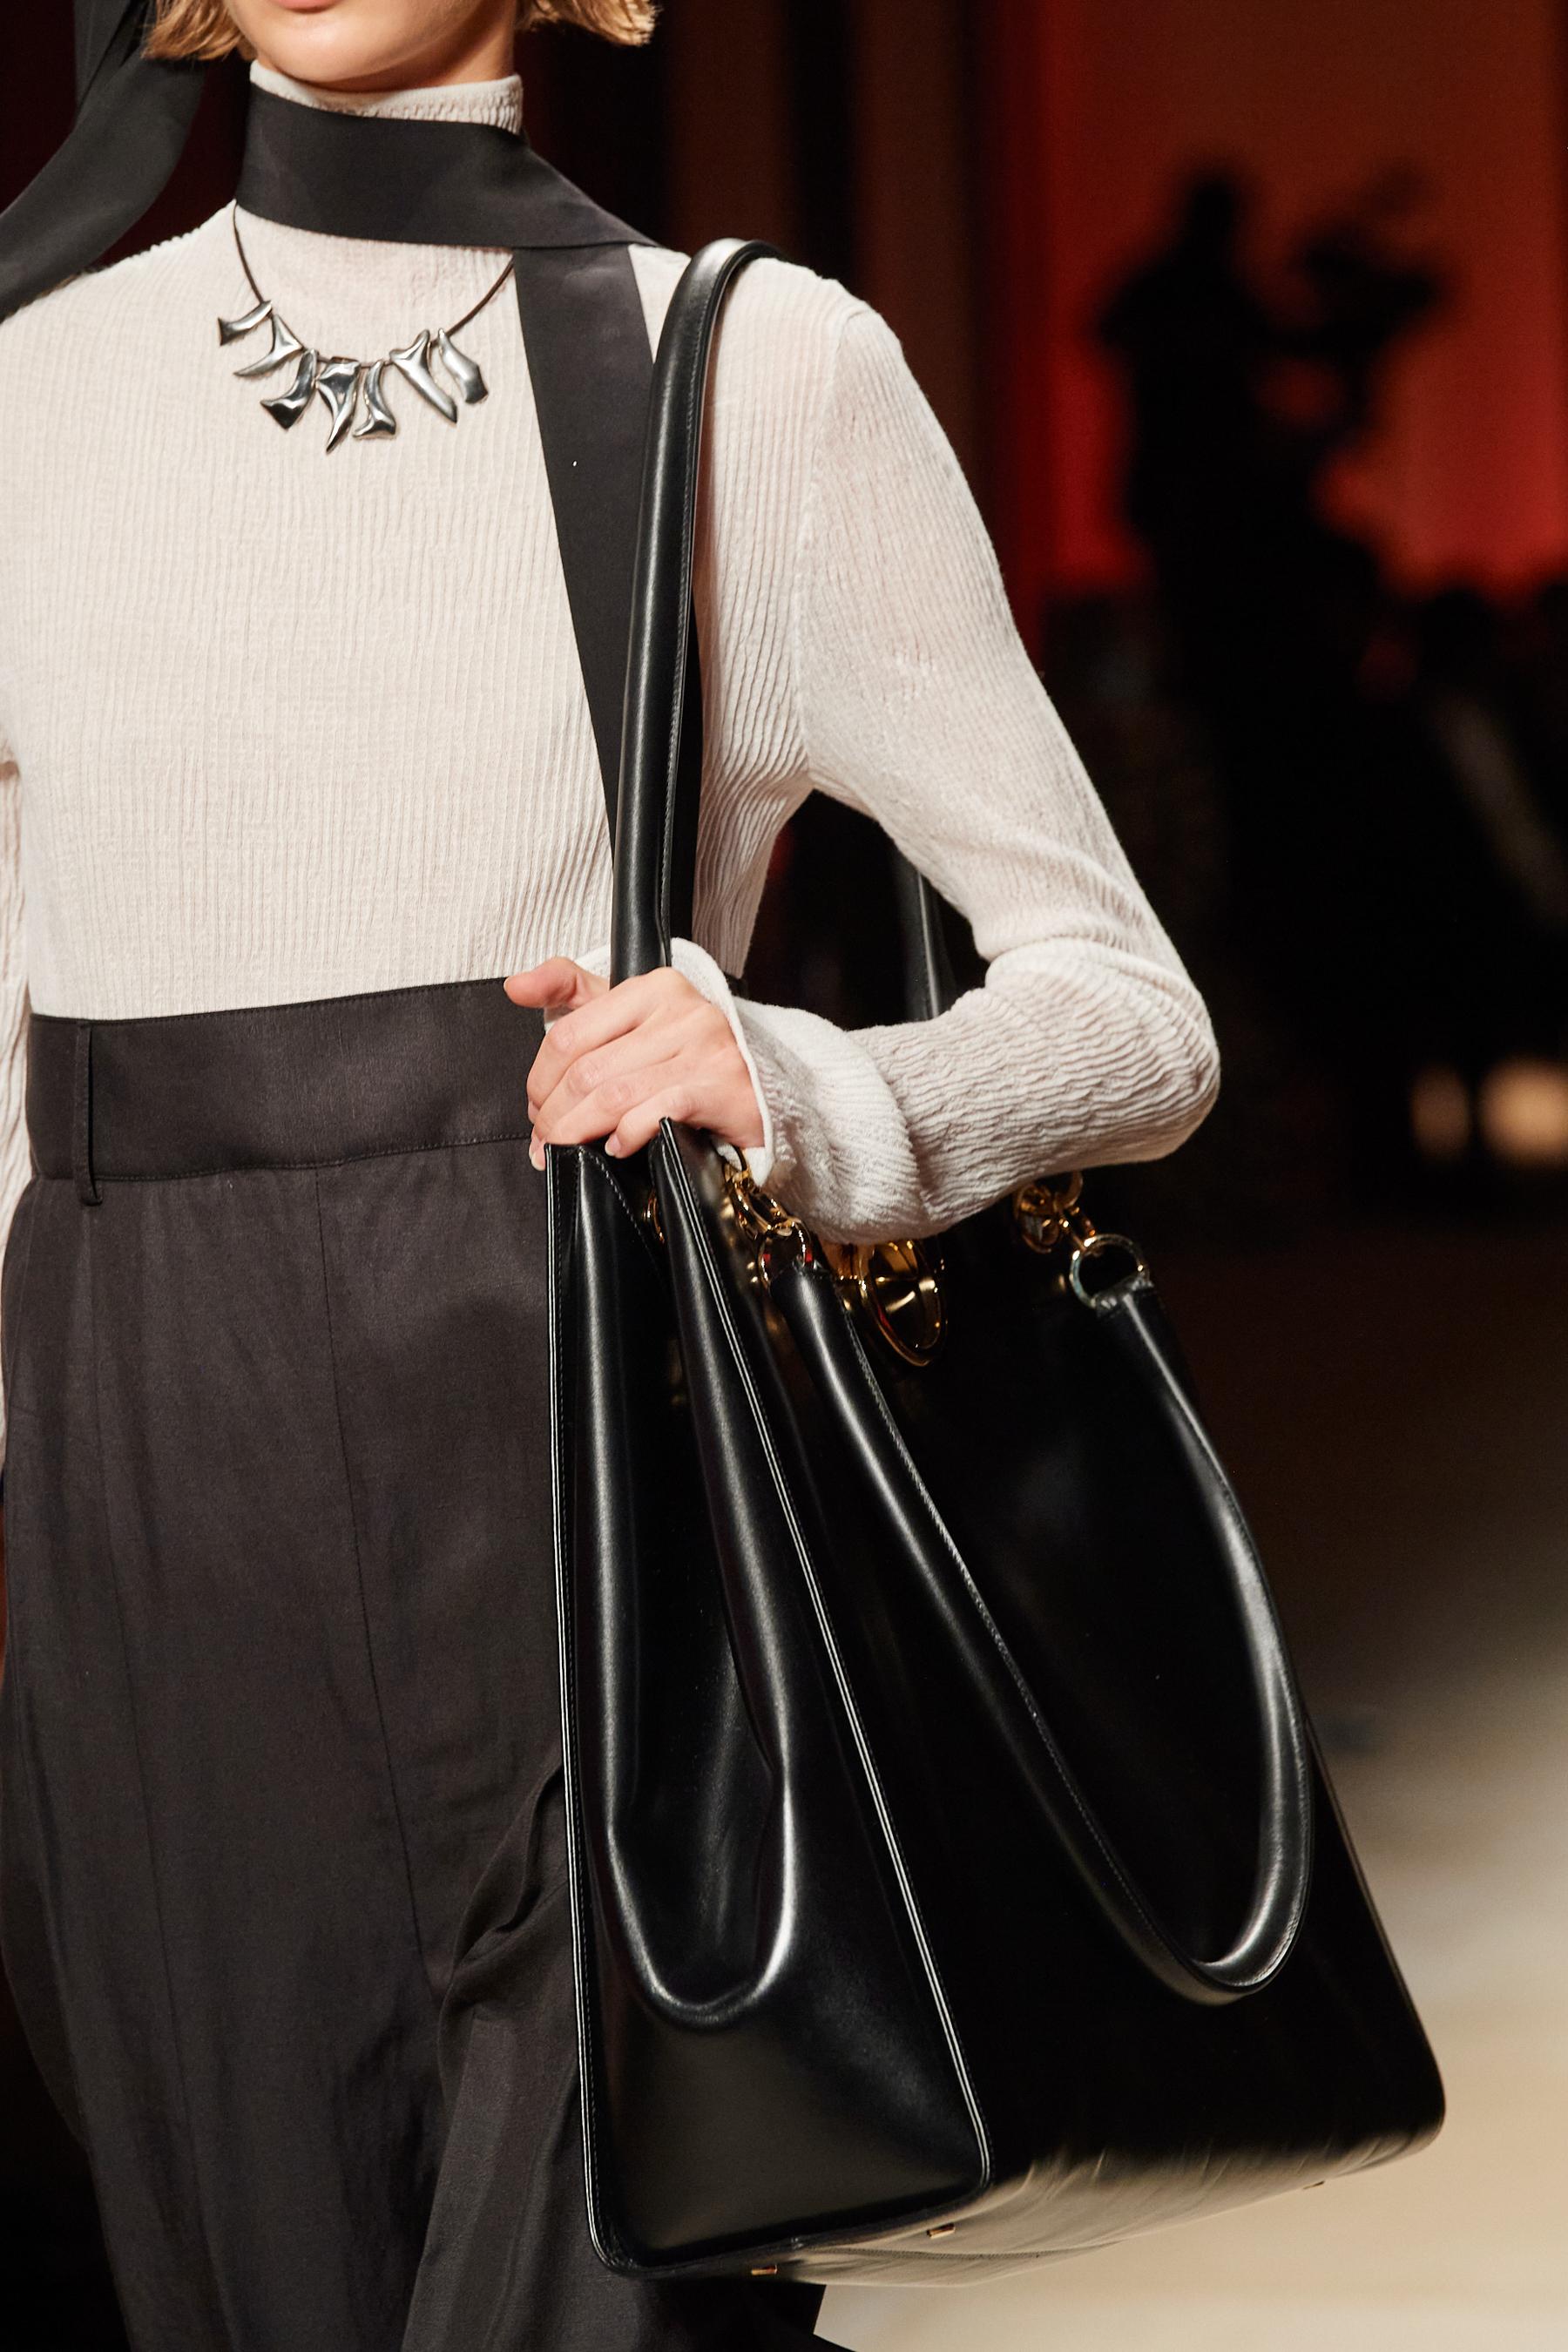 Salvatore Ferragamo Spring 2022 Details Fashion Show